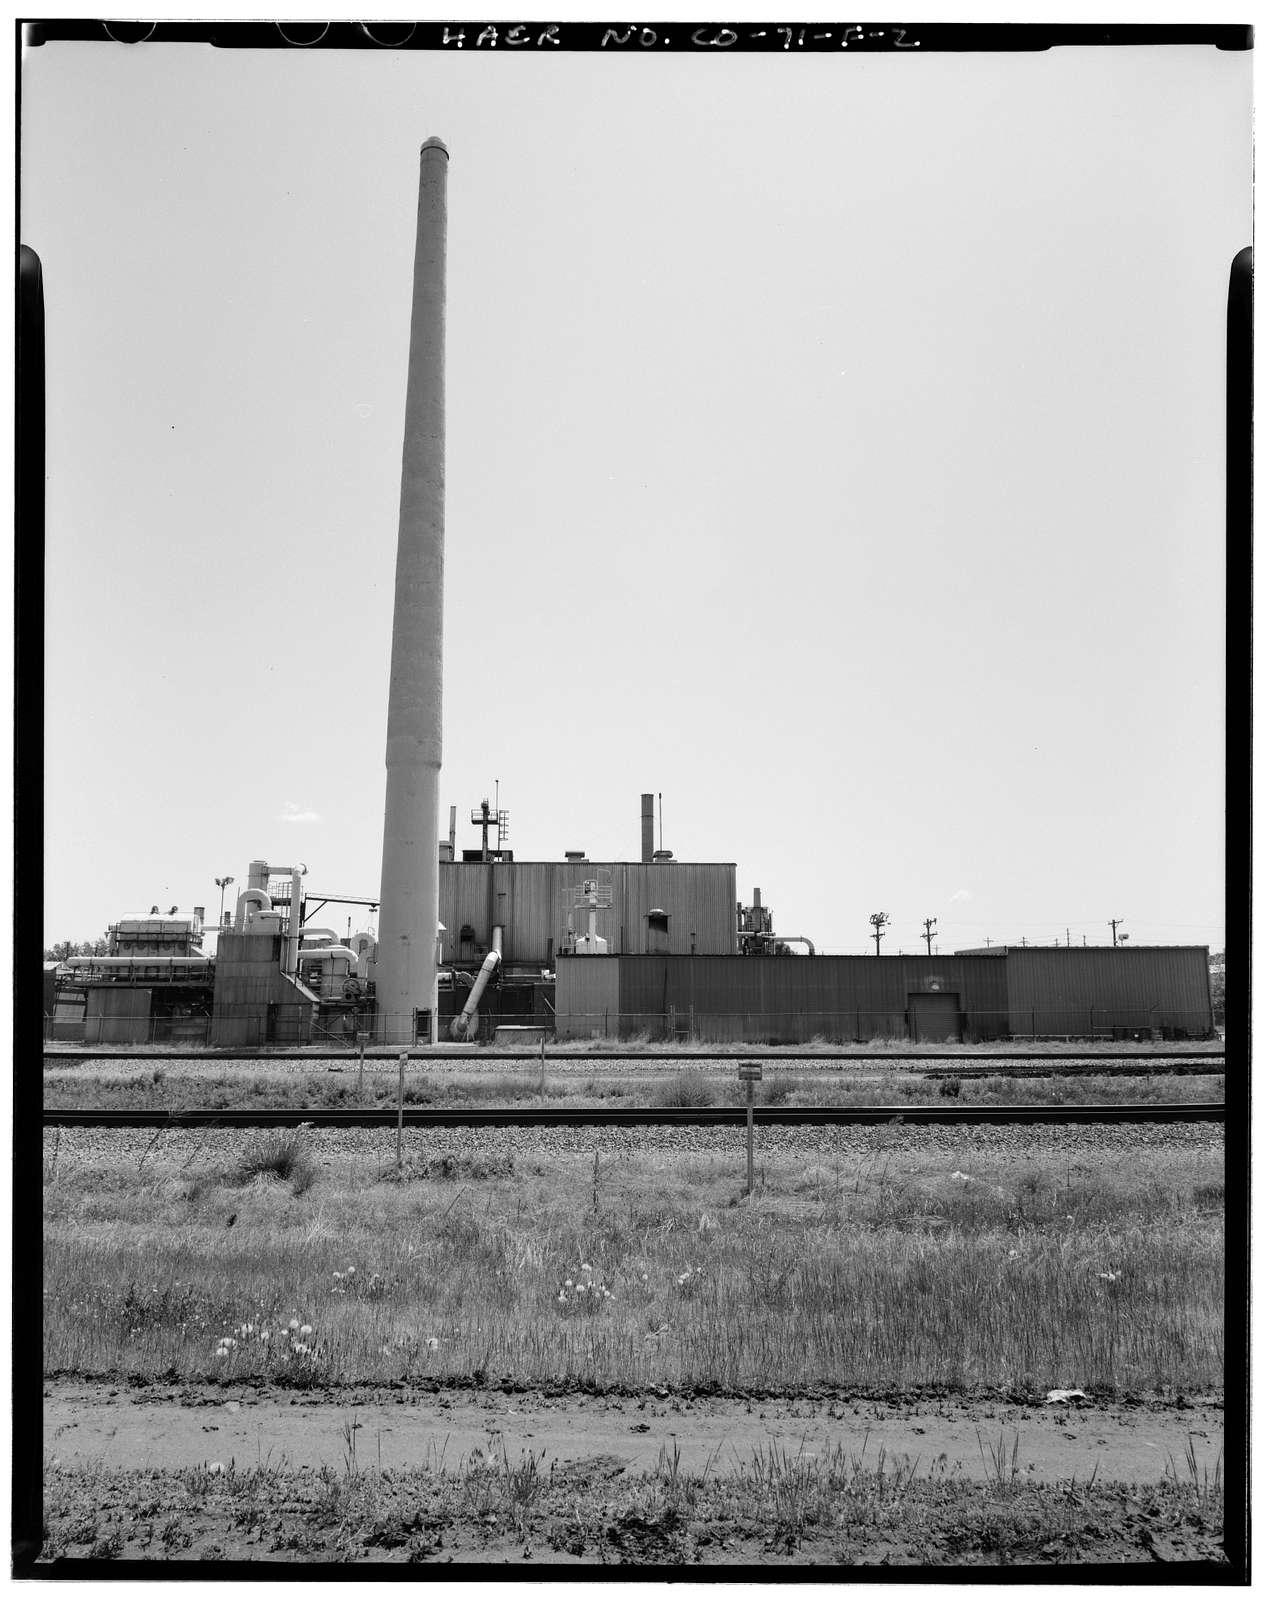 S. W. Shattuck Chemical Company, Incorporated, Building No. 6, 1805 South Bannock Street, Denver, Denver County, CO